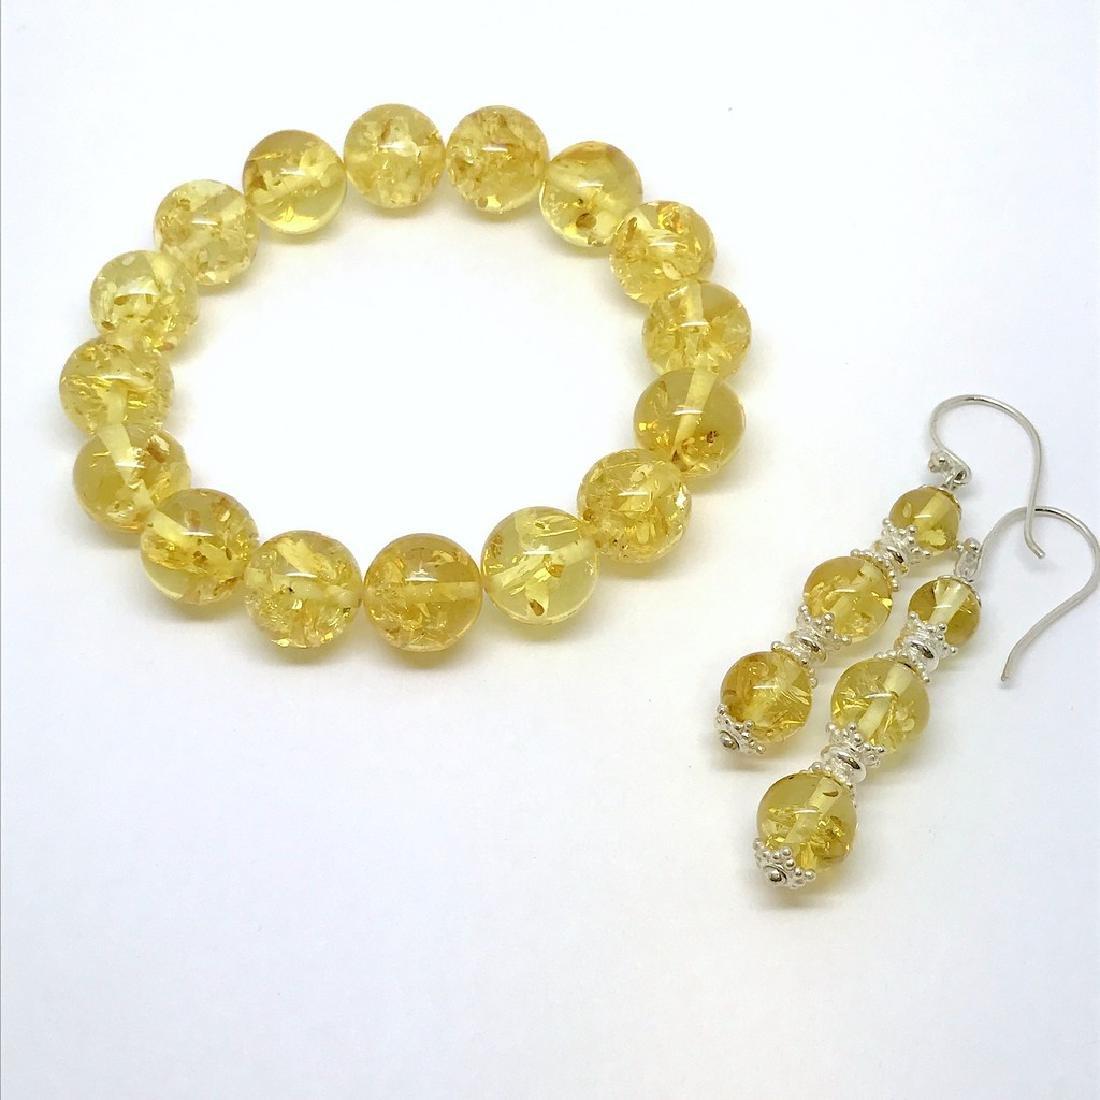 Baltic amber & sterling silver bracelet & earrings 19 - 6